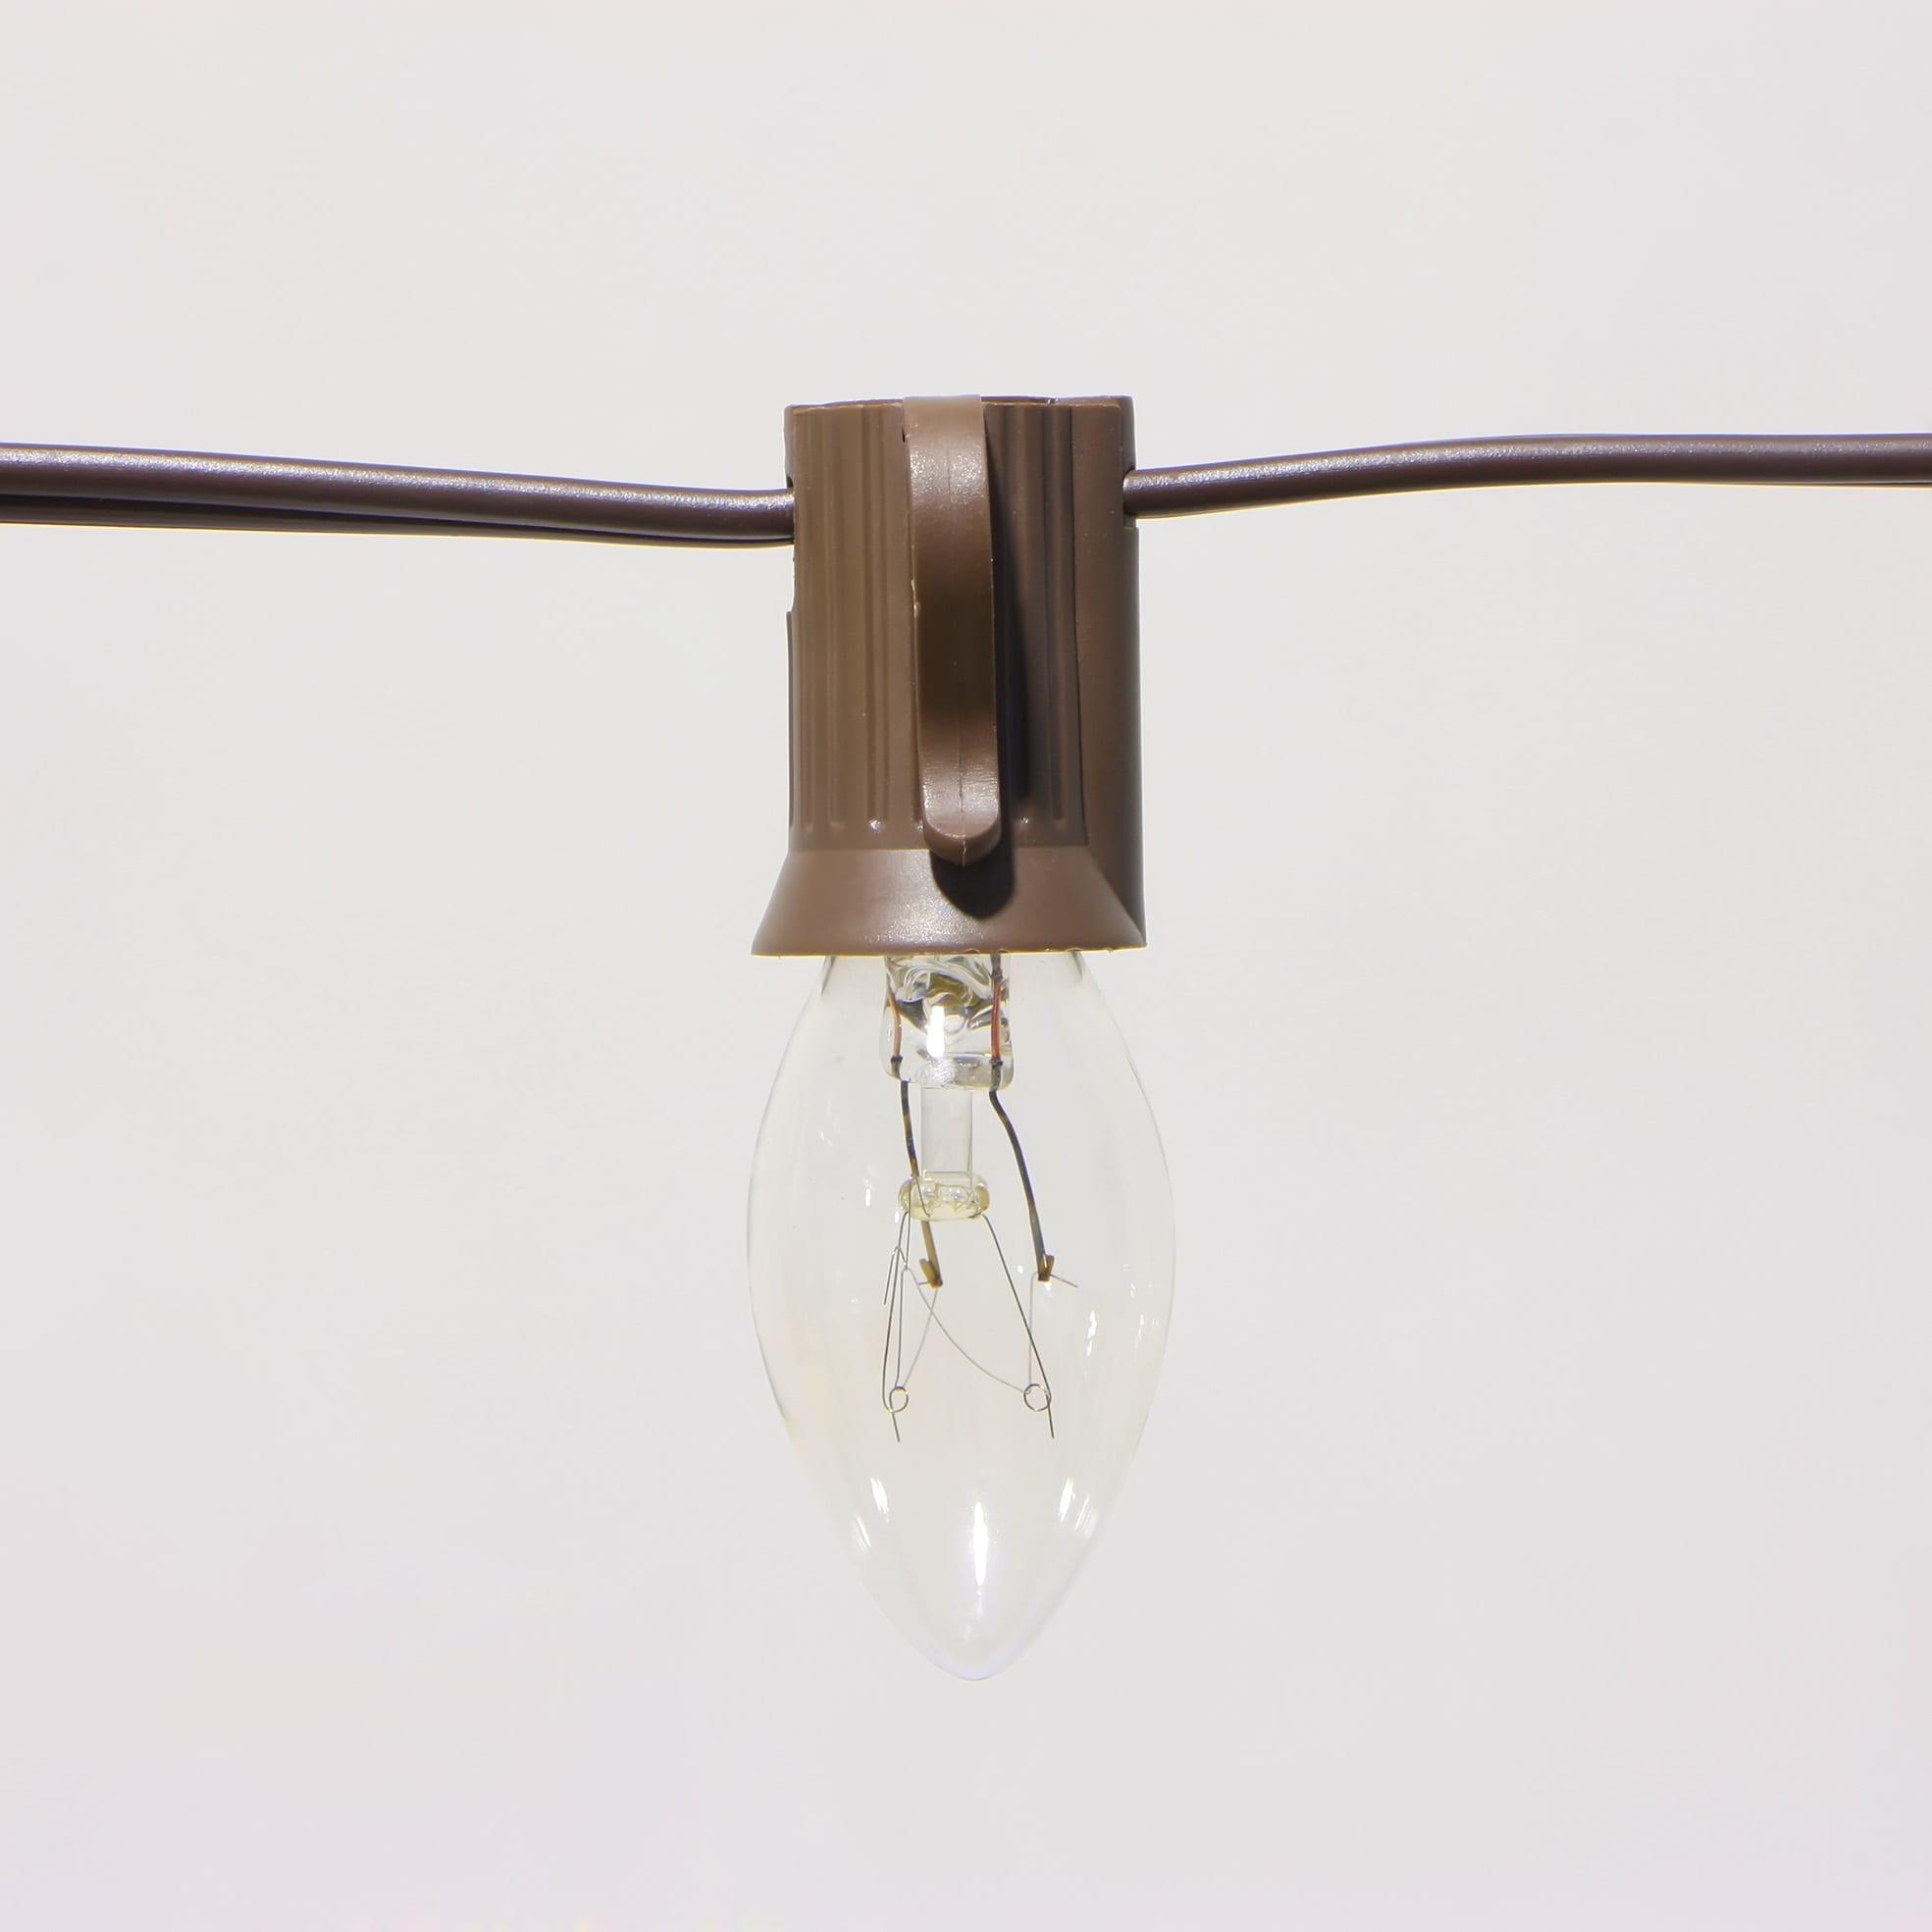 Matt Prepainted Galvalume Steel Sheet Edison Lights Indoor - Incandescent String Light  MYHH41059-C9 – Zhongxin